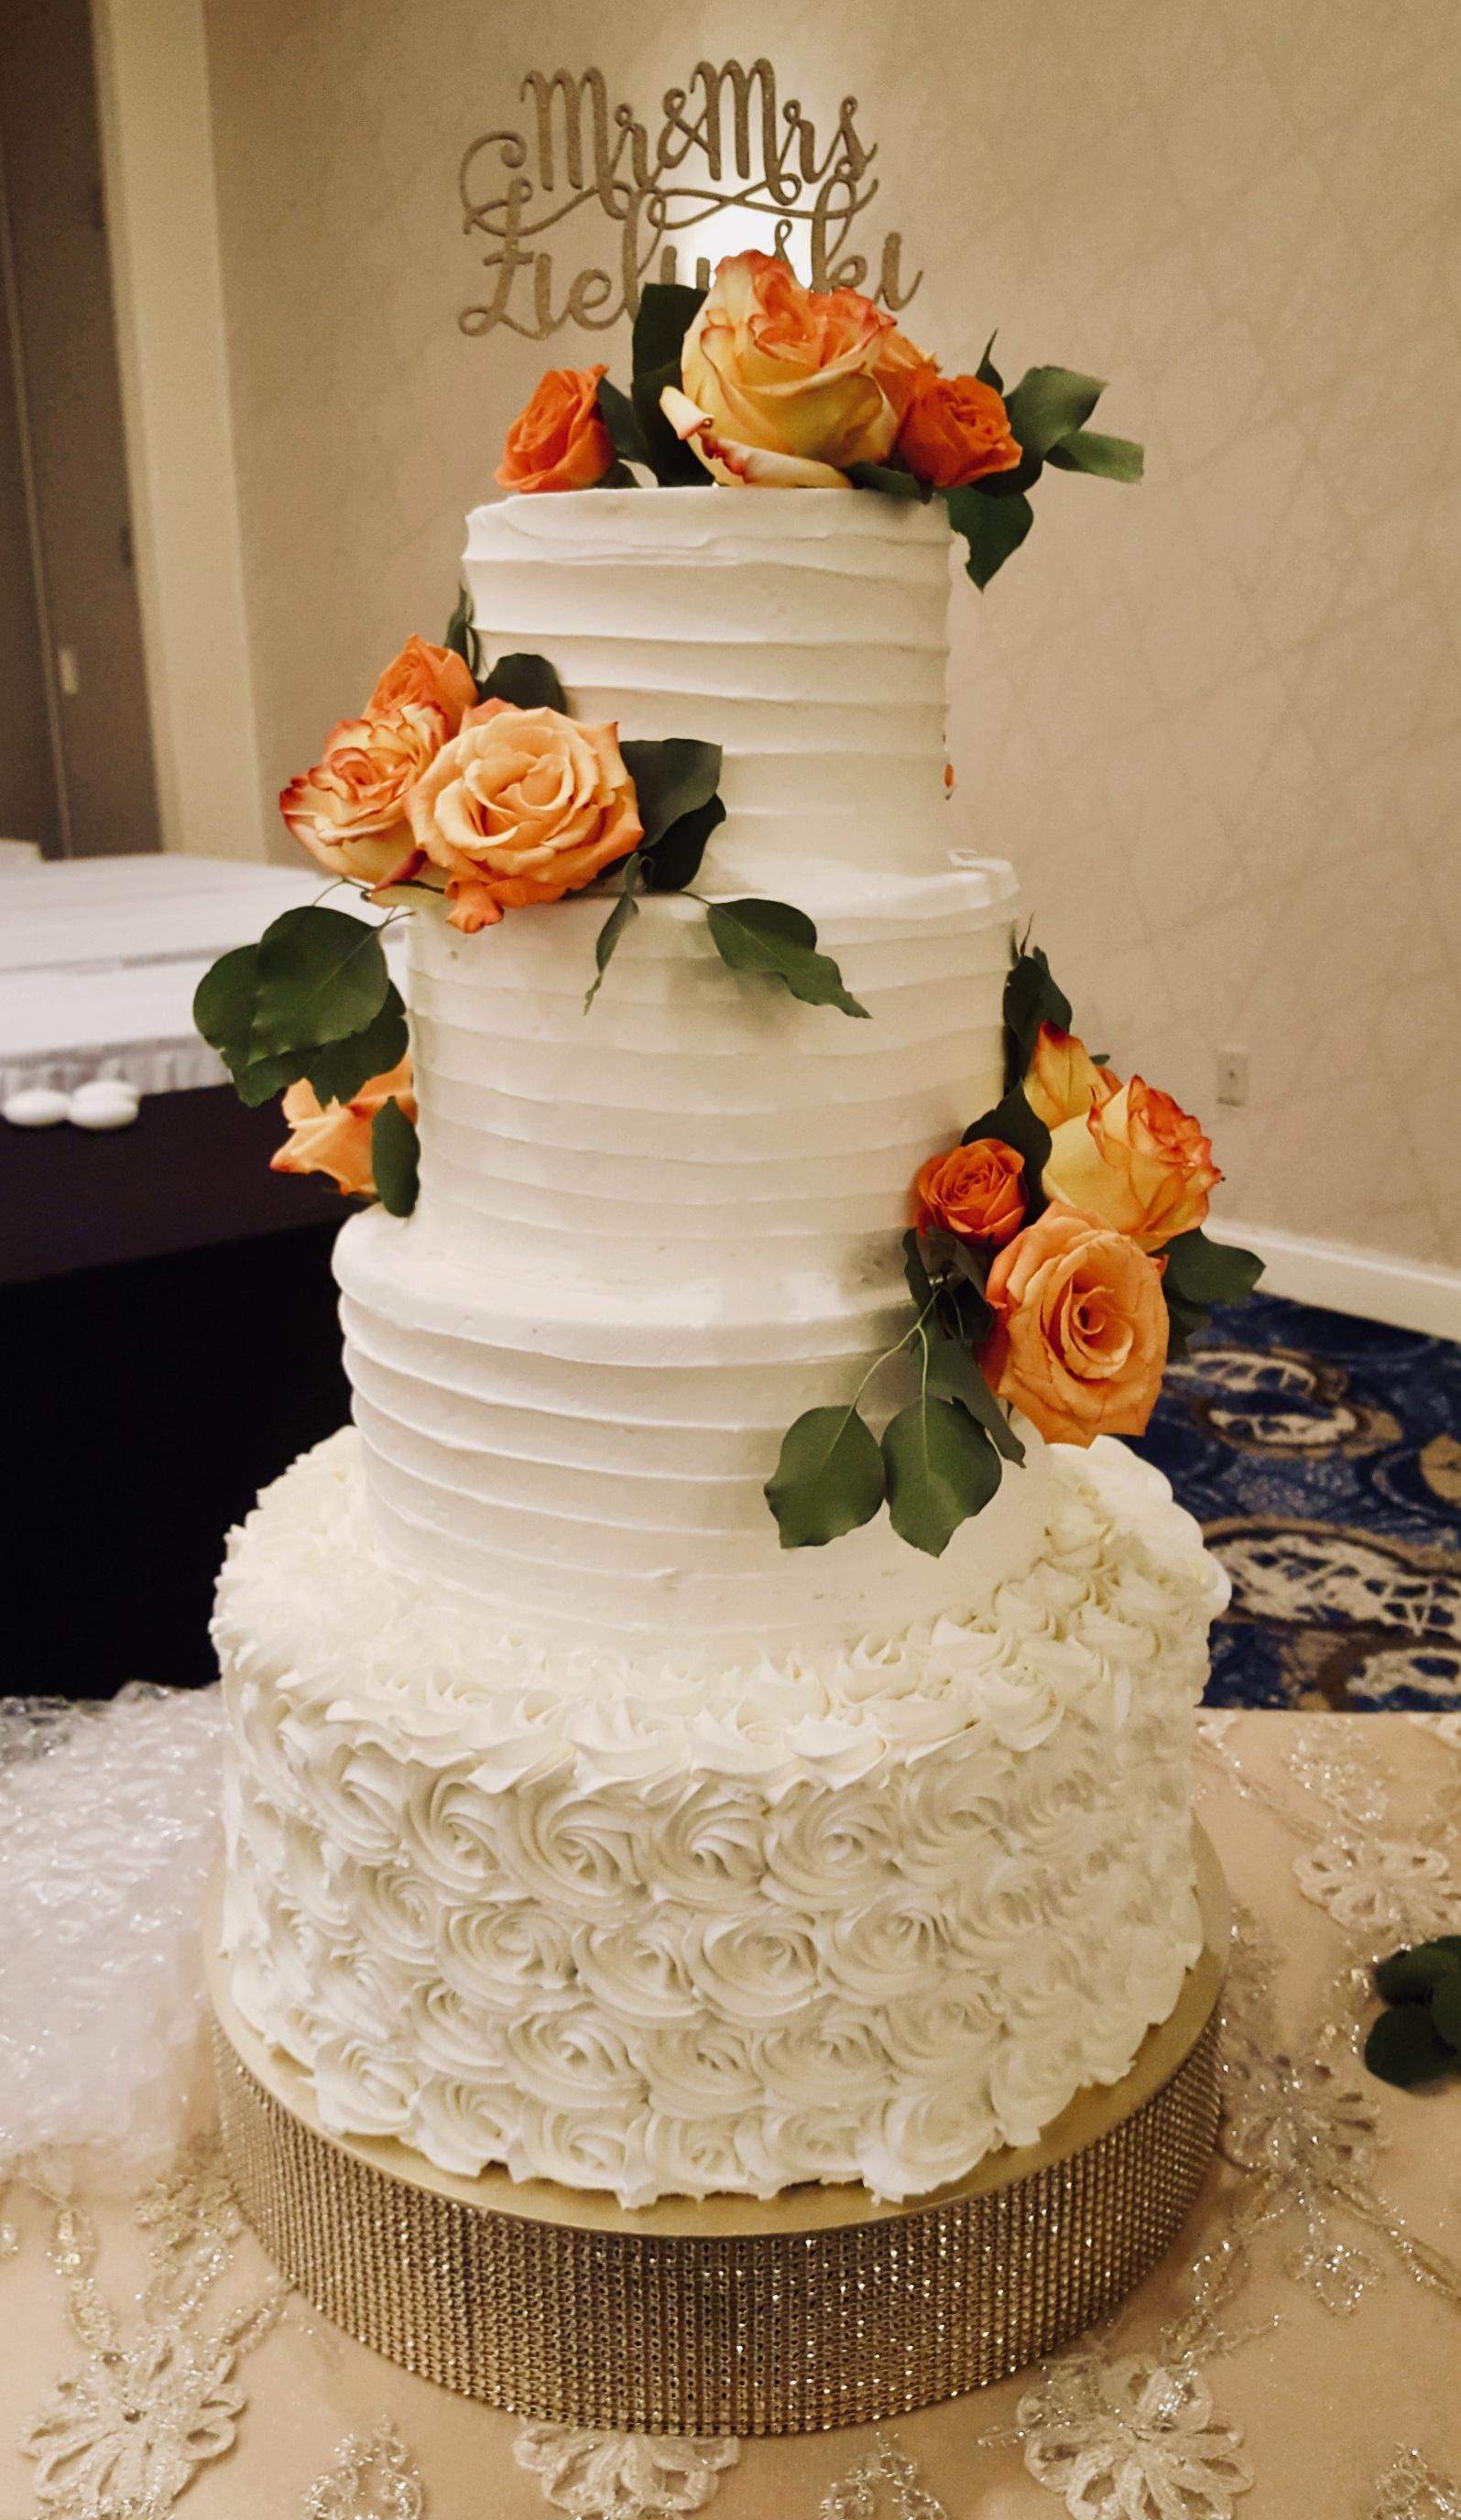 Wedding4tierwhiteRossettebottom.jpg